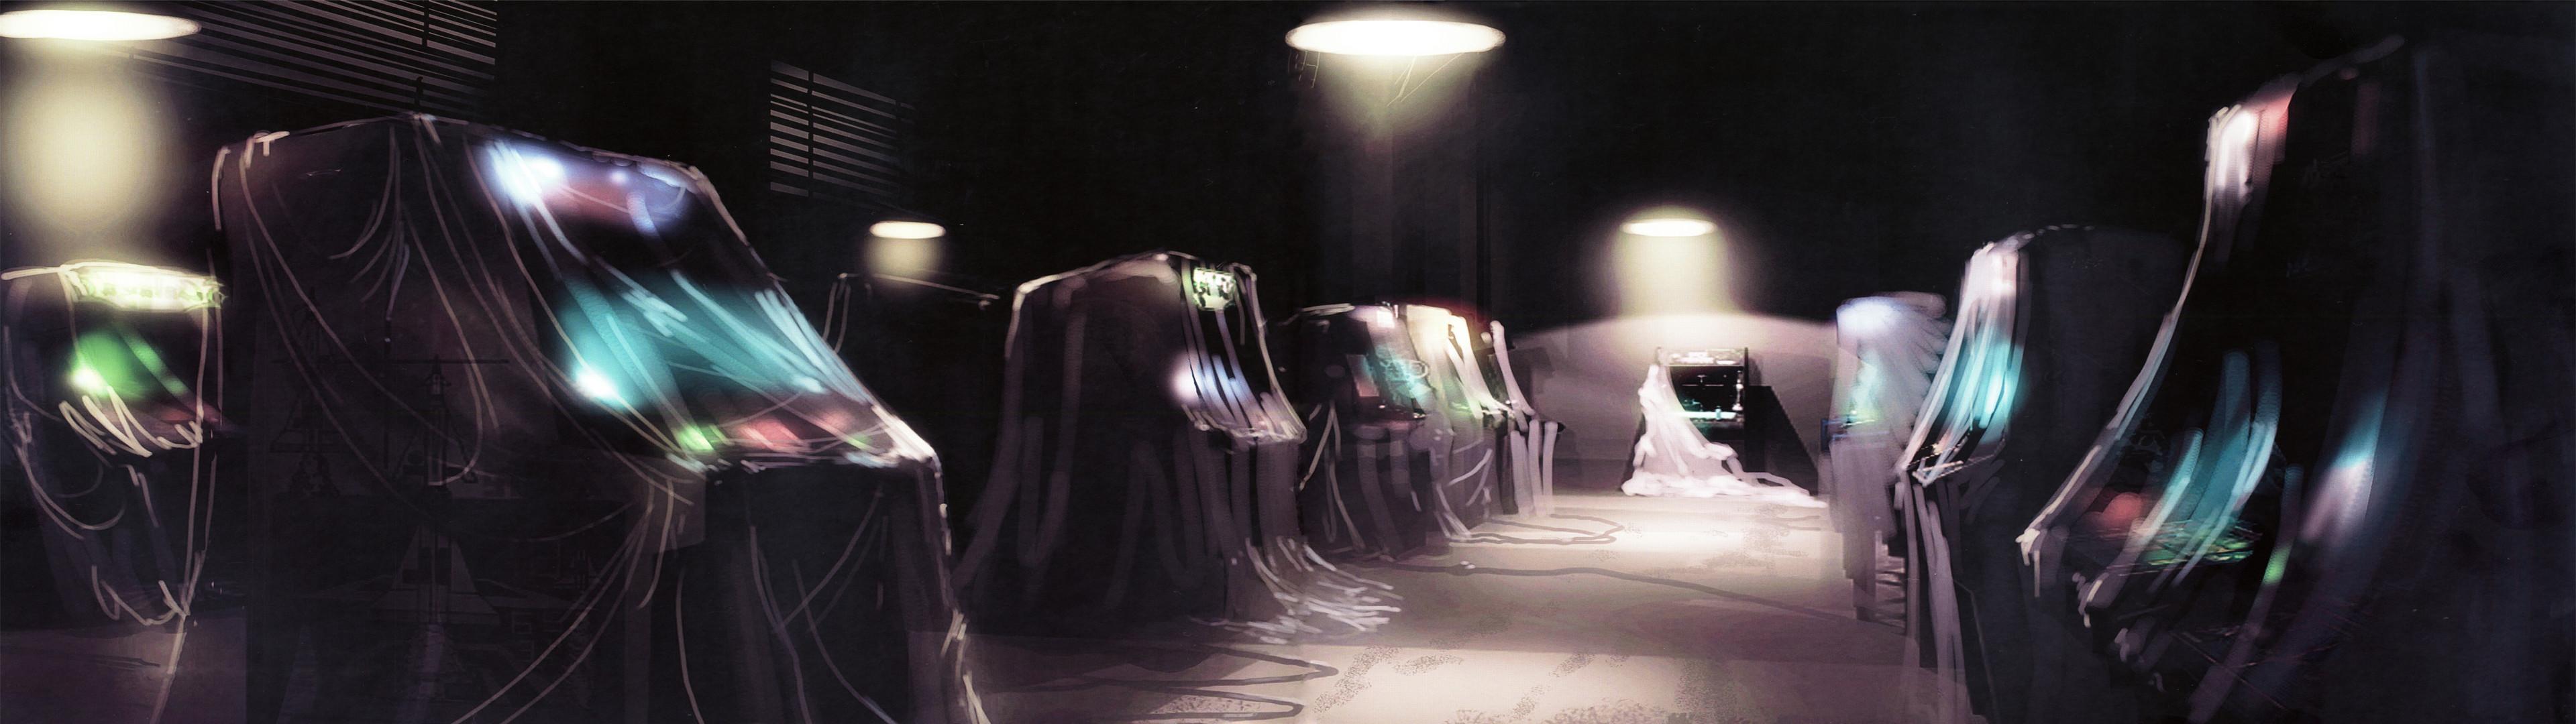 General dual monitors multiple display arcade arcade cabinet  artwork Tron: Legacy lights